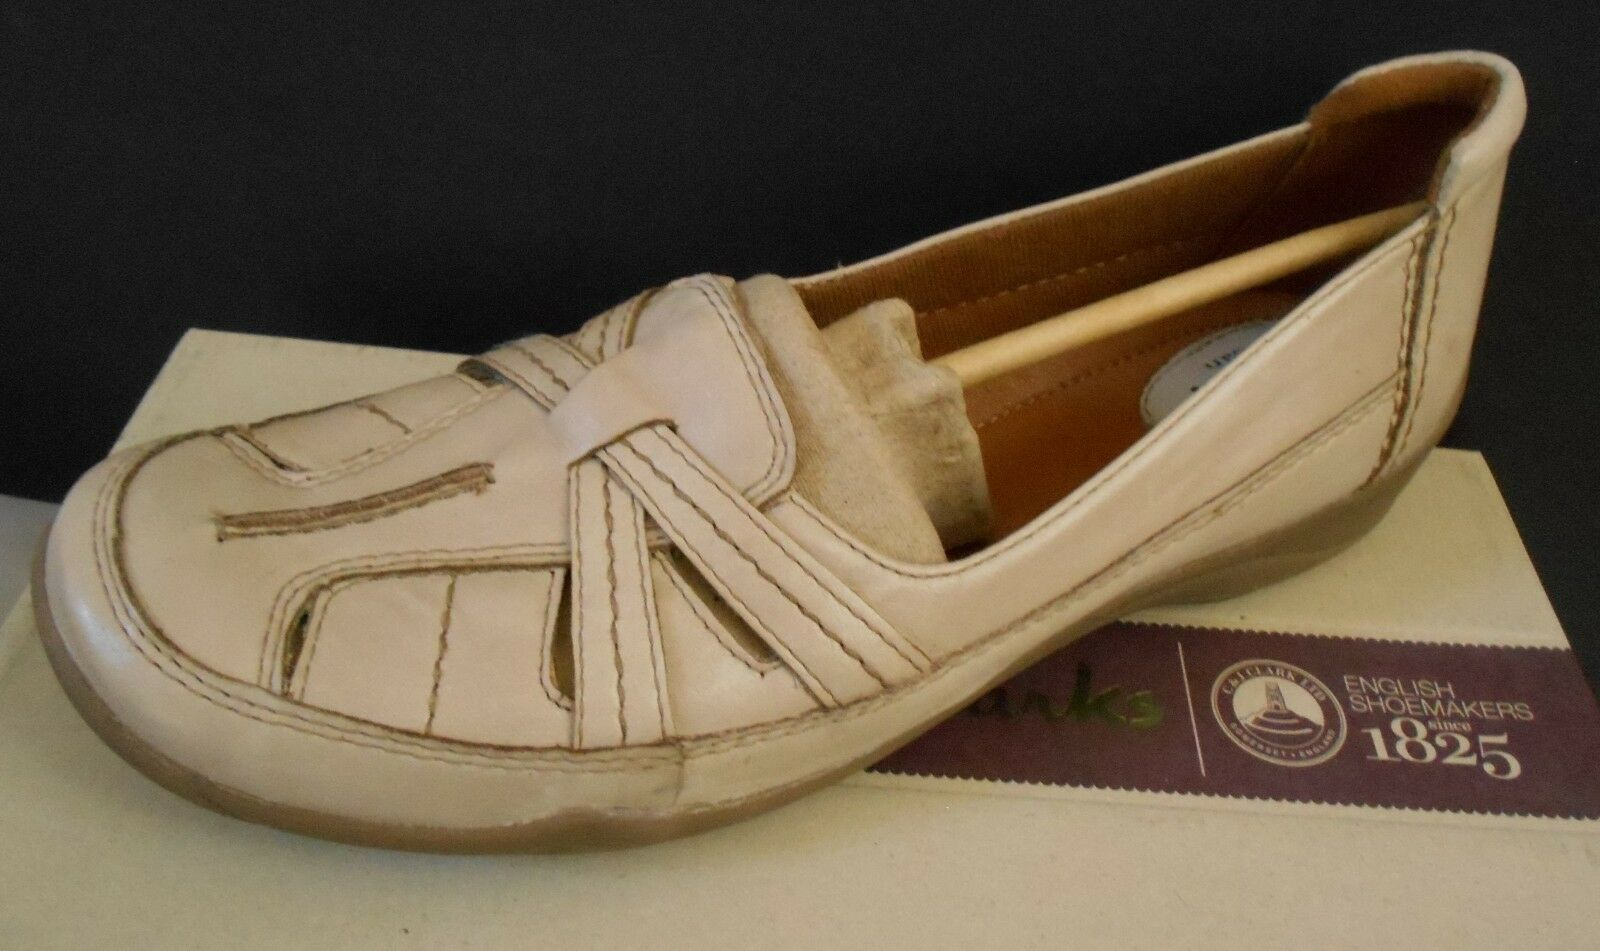 Clarks Women's ARTISAN Slip On Tan Tan Tan Leather shoes 9.5 M 78c12d